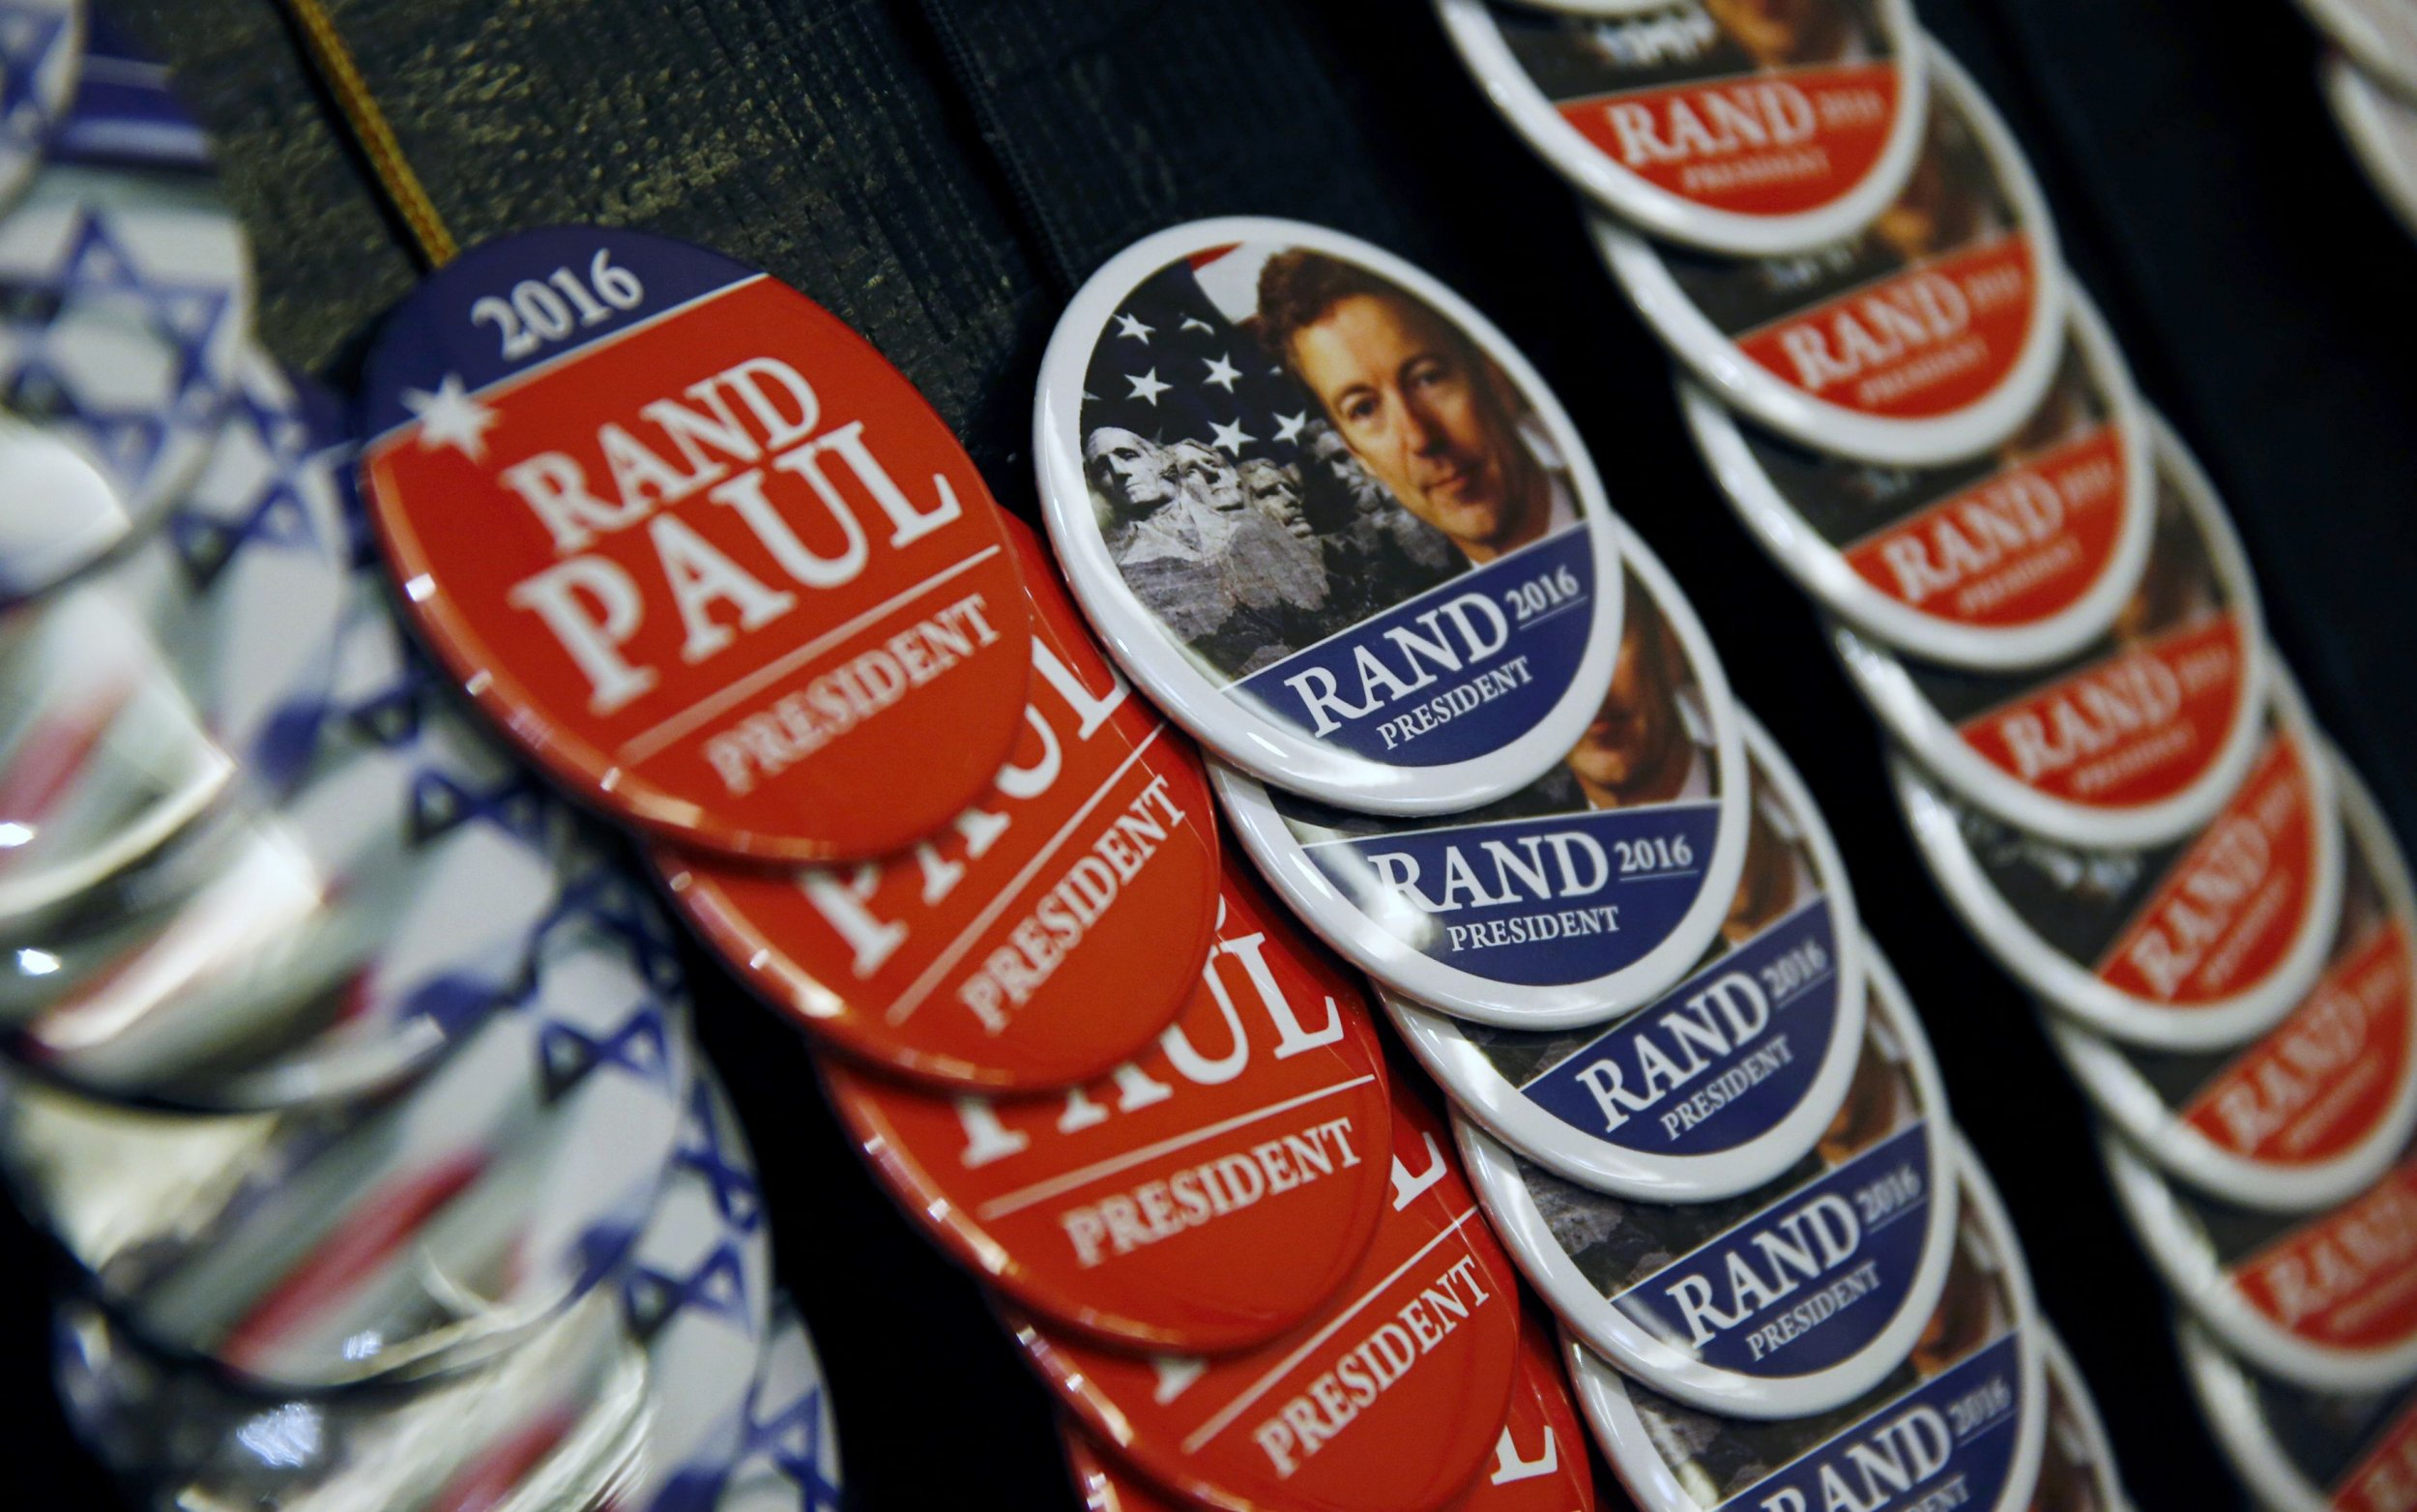 2015-04-07T175524Z_1176651563_TB3EB471DS2FV_RTRMADP_3_USA-ELECTION-PAUL